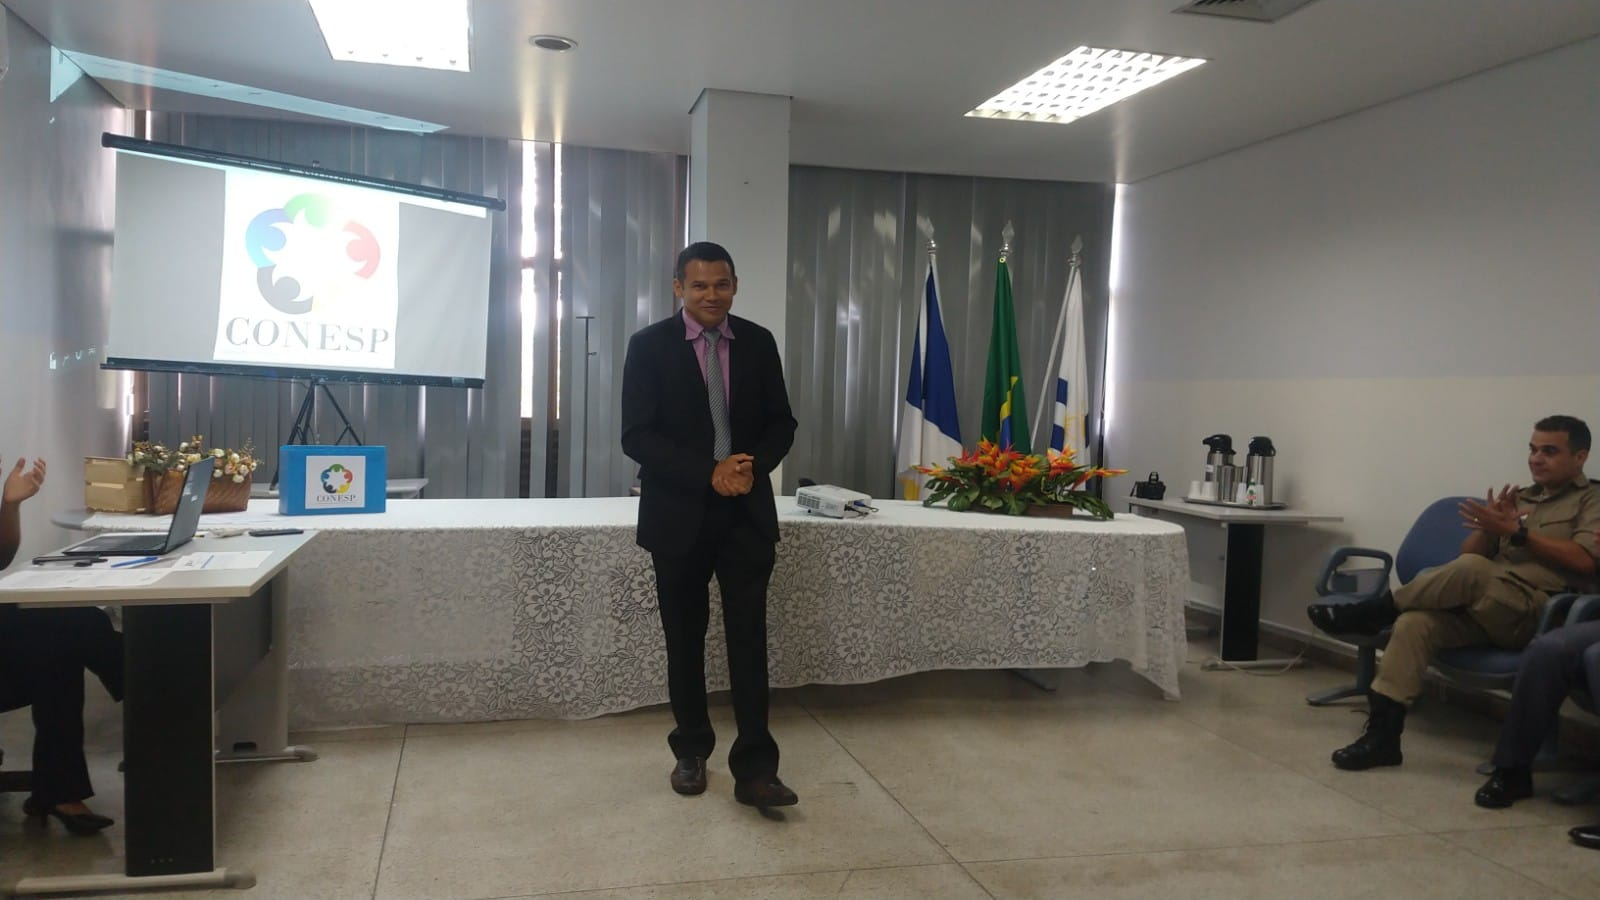 Representante do Sindiperito integrará Conselho Estadual da Segurança Publica